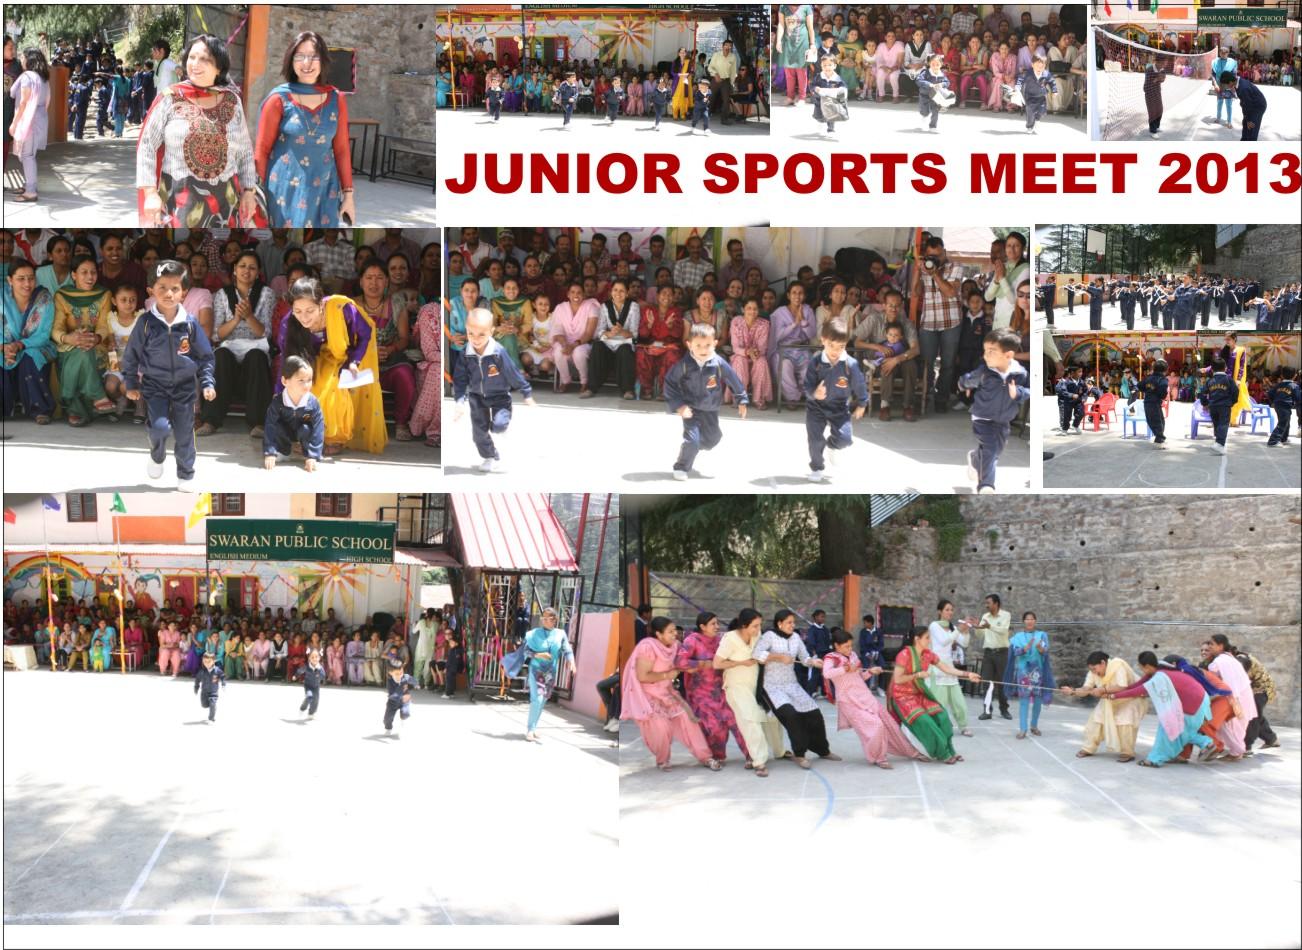 school sports meet 2013 oscar